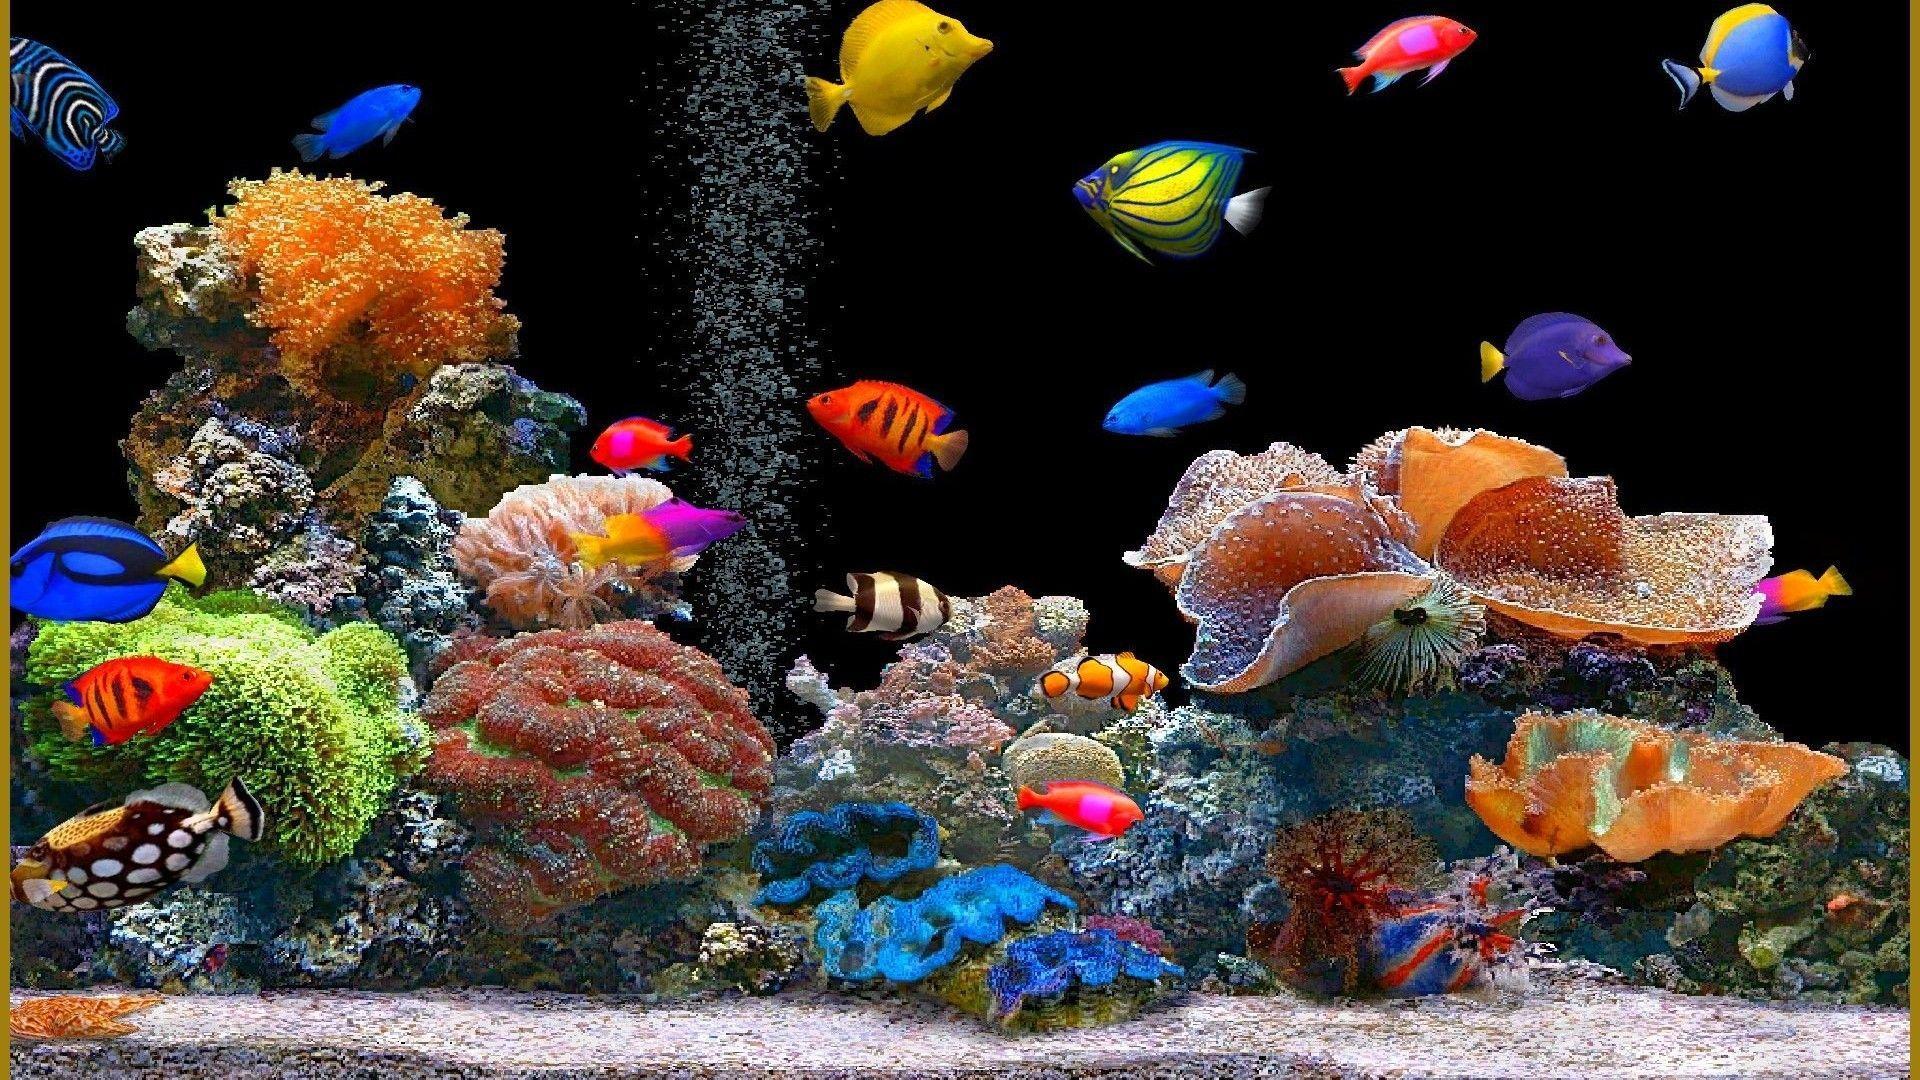 Cartoon Aquarium Wallpapers   Top Free Cartoon Aquarium ...